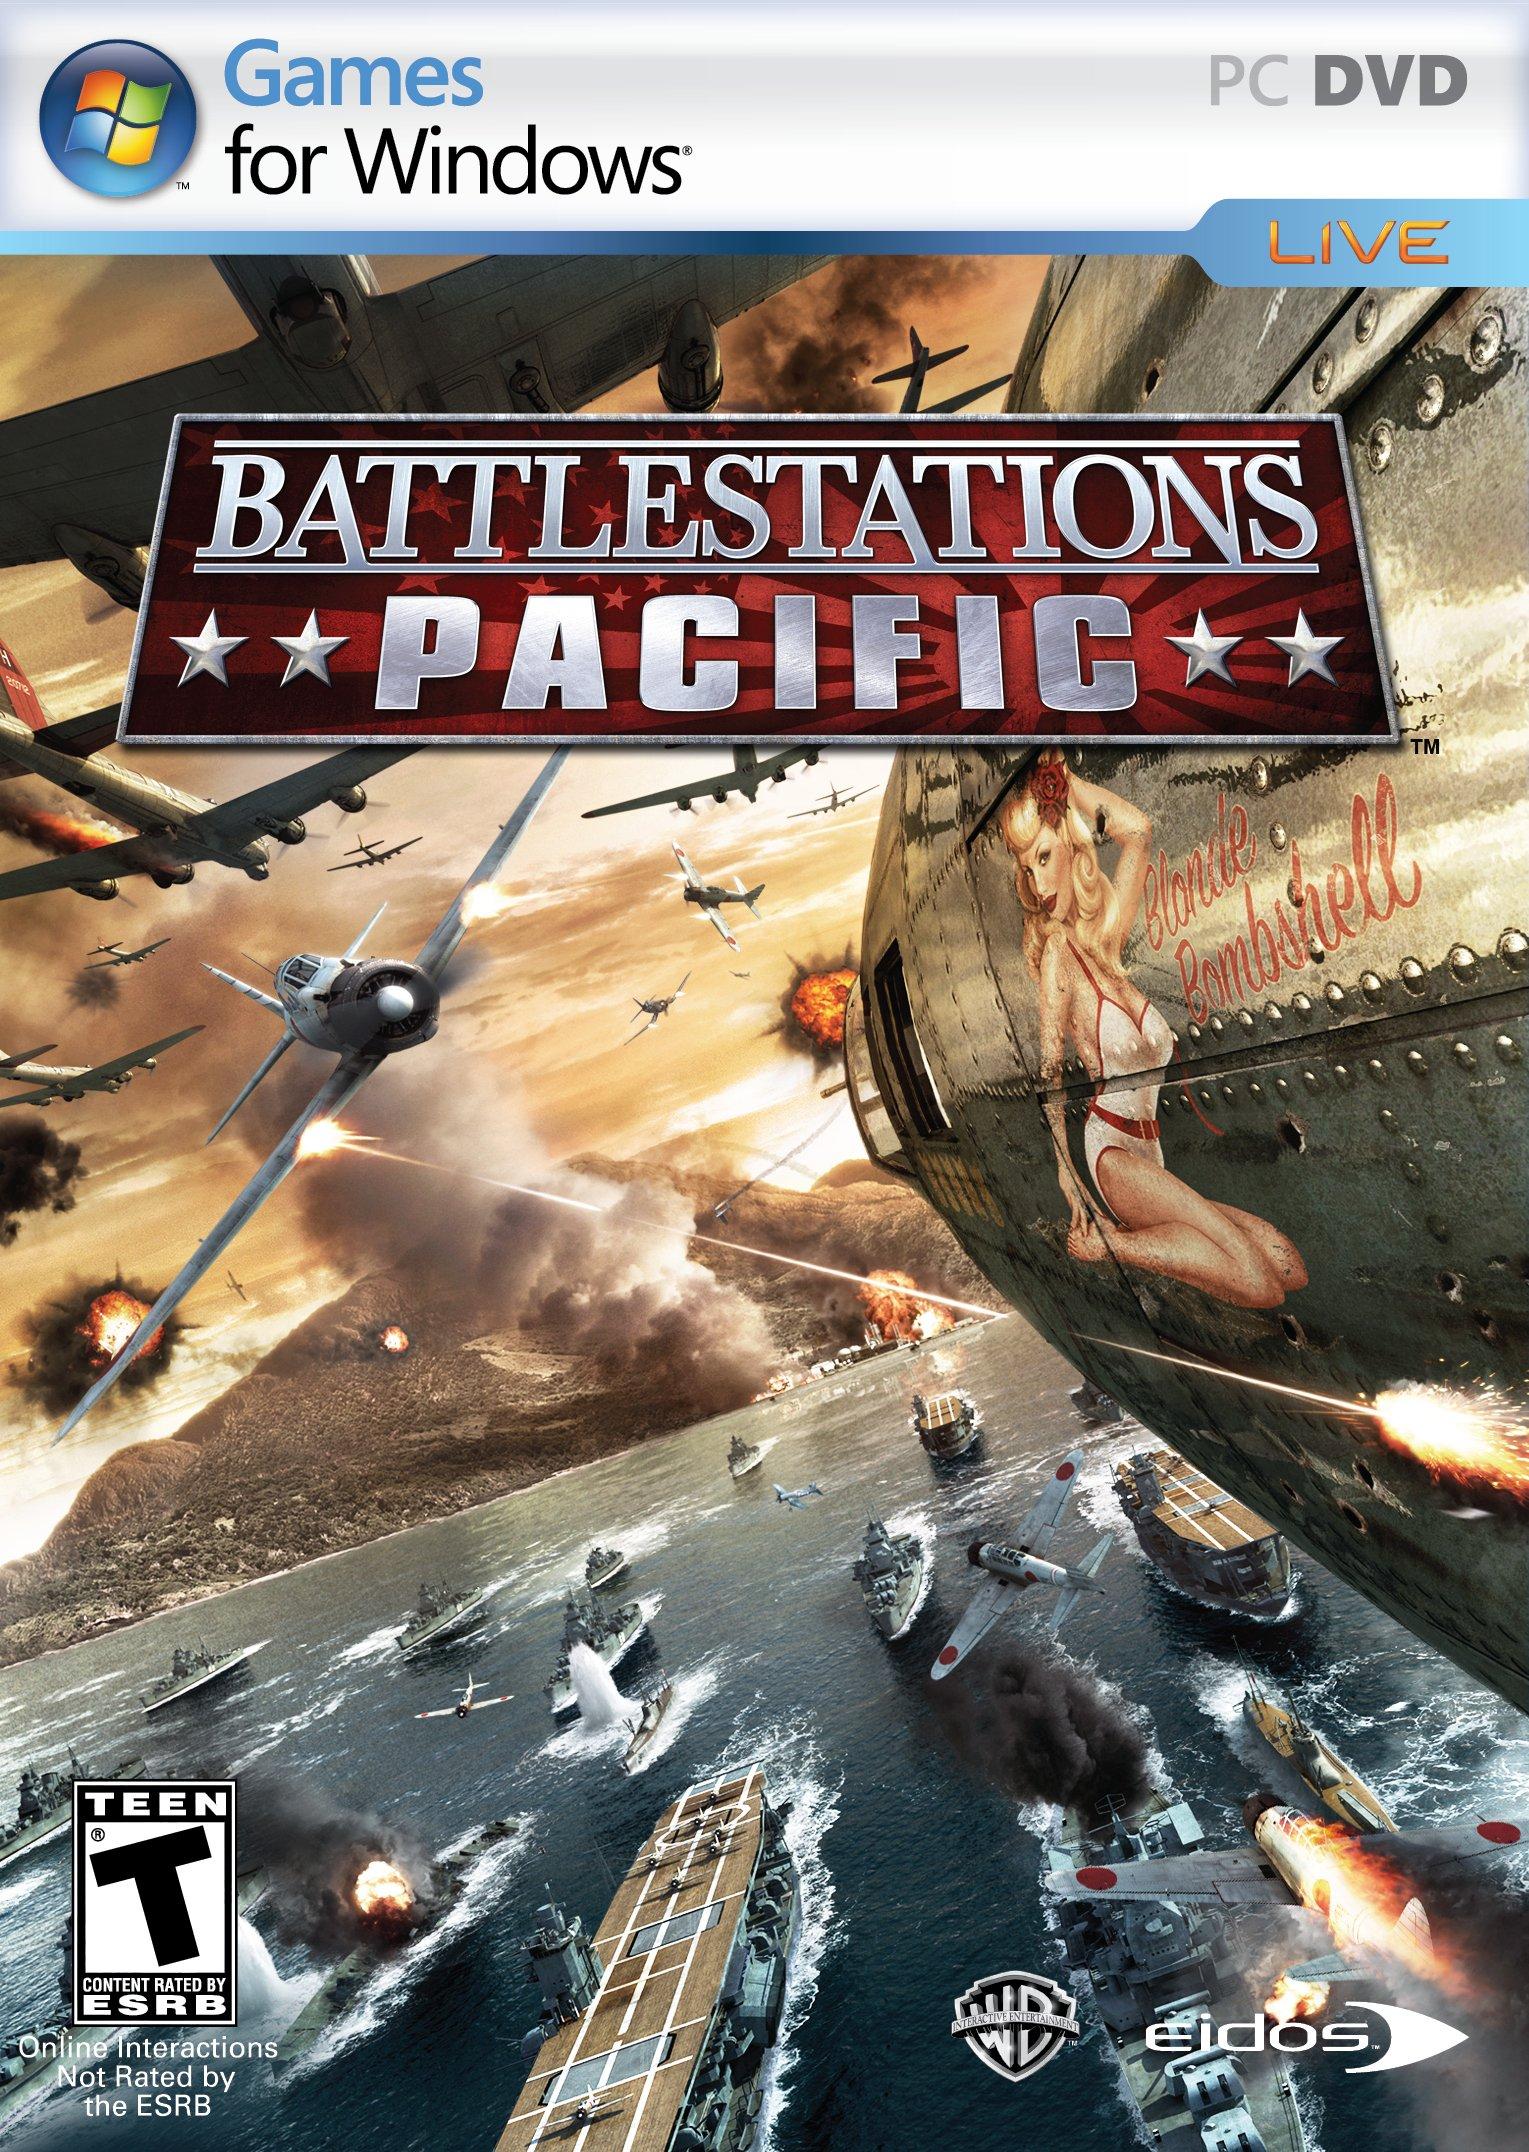 Battlestations_Pacific_Windows_box.jpg